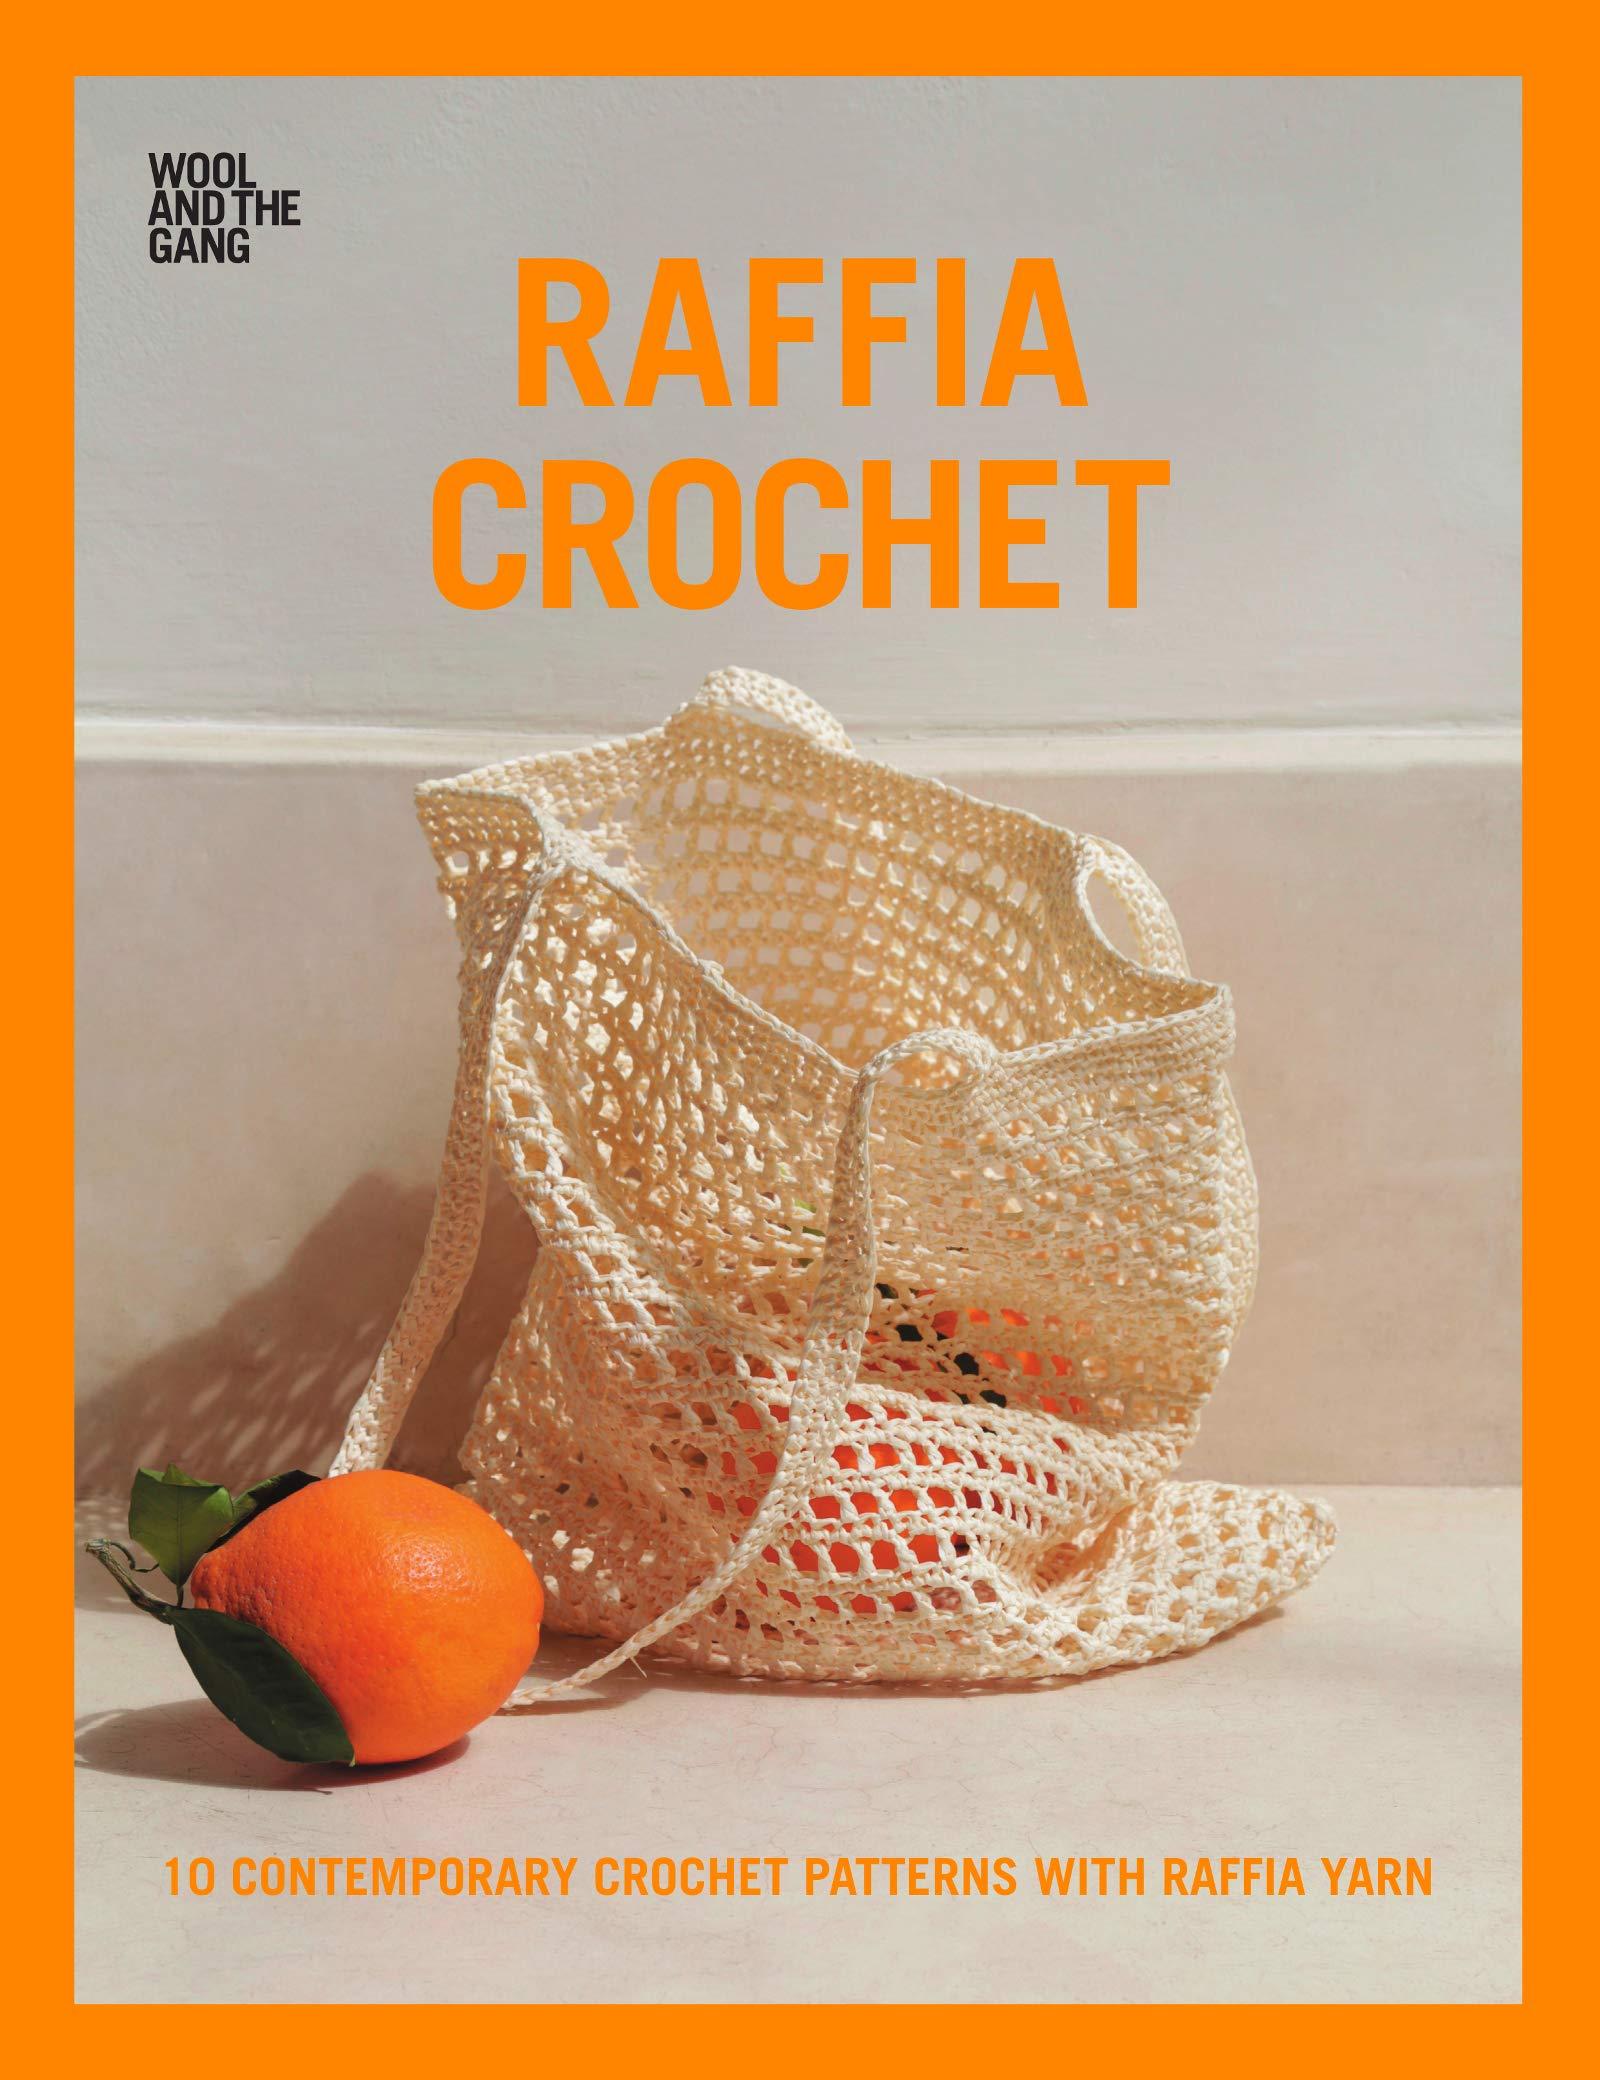 Raffia Crochet: 10 Contemporary Crochet Patterns with Raffia